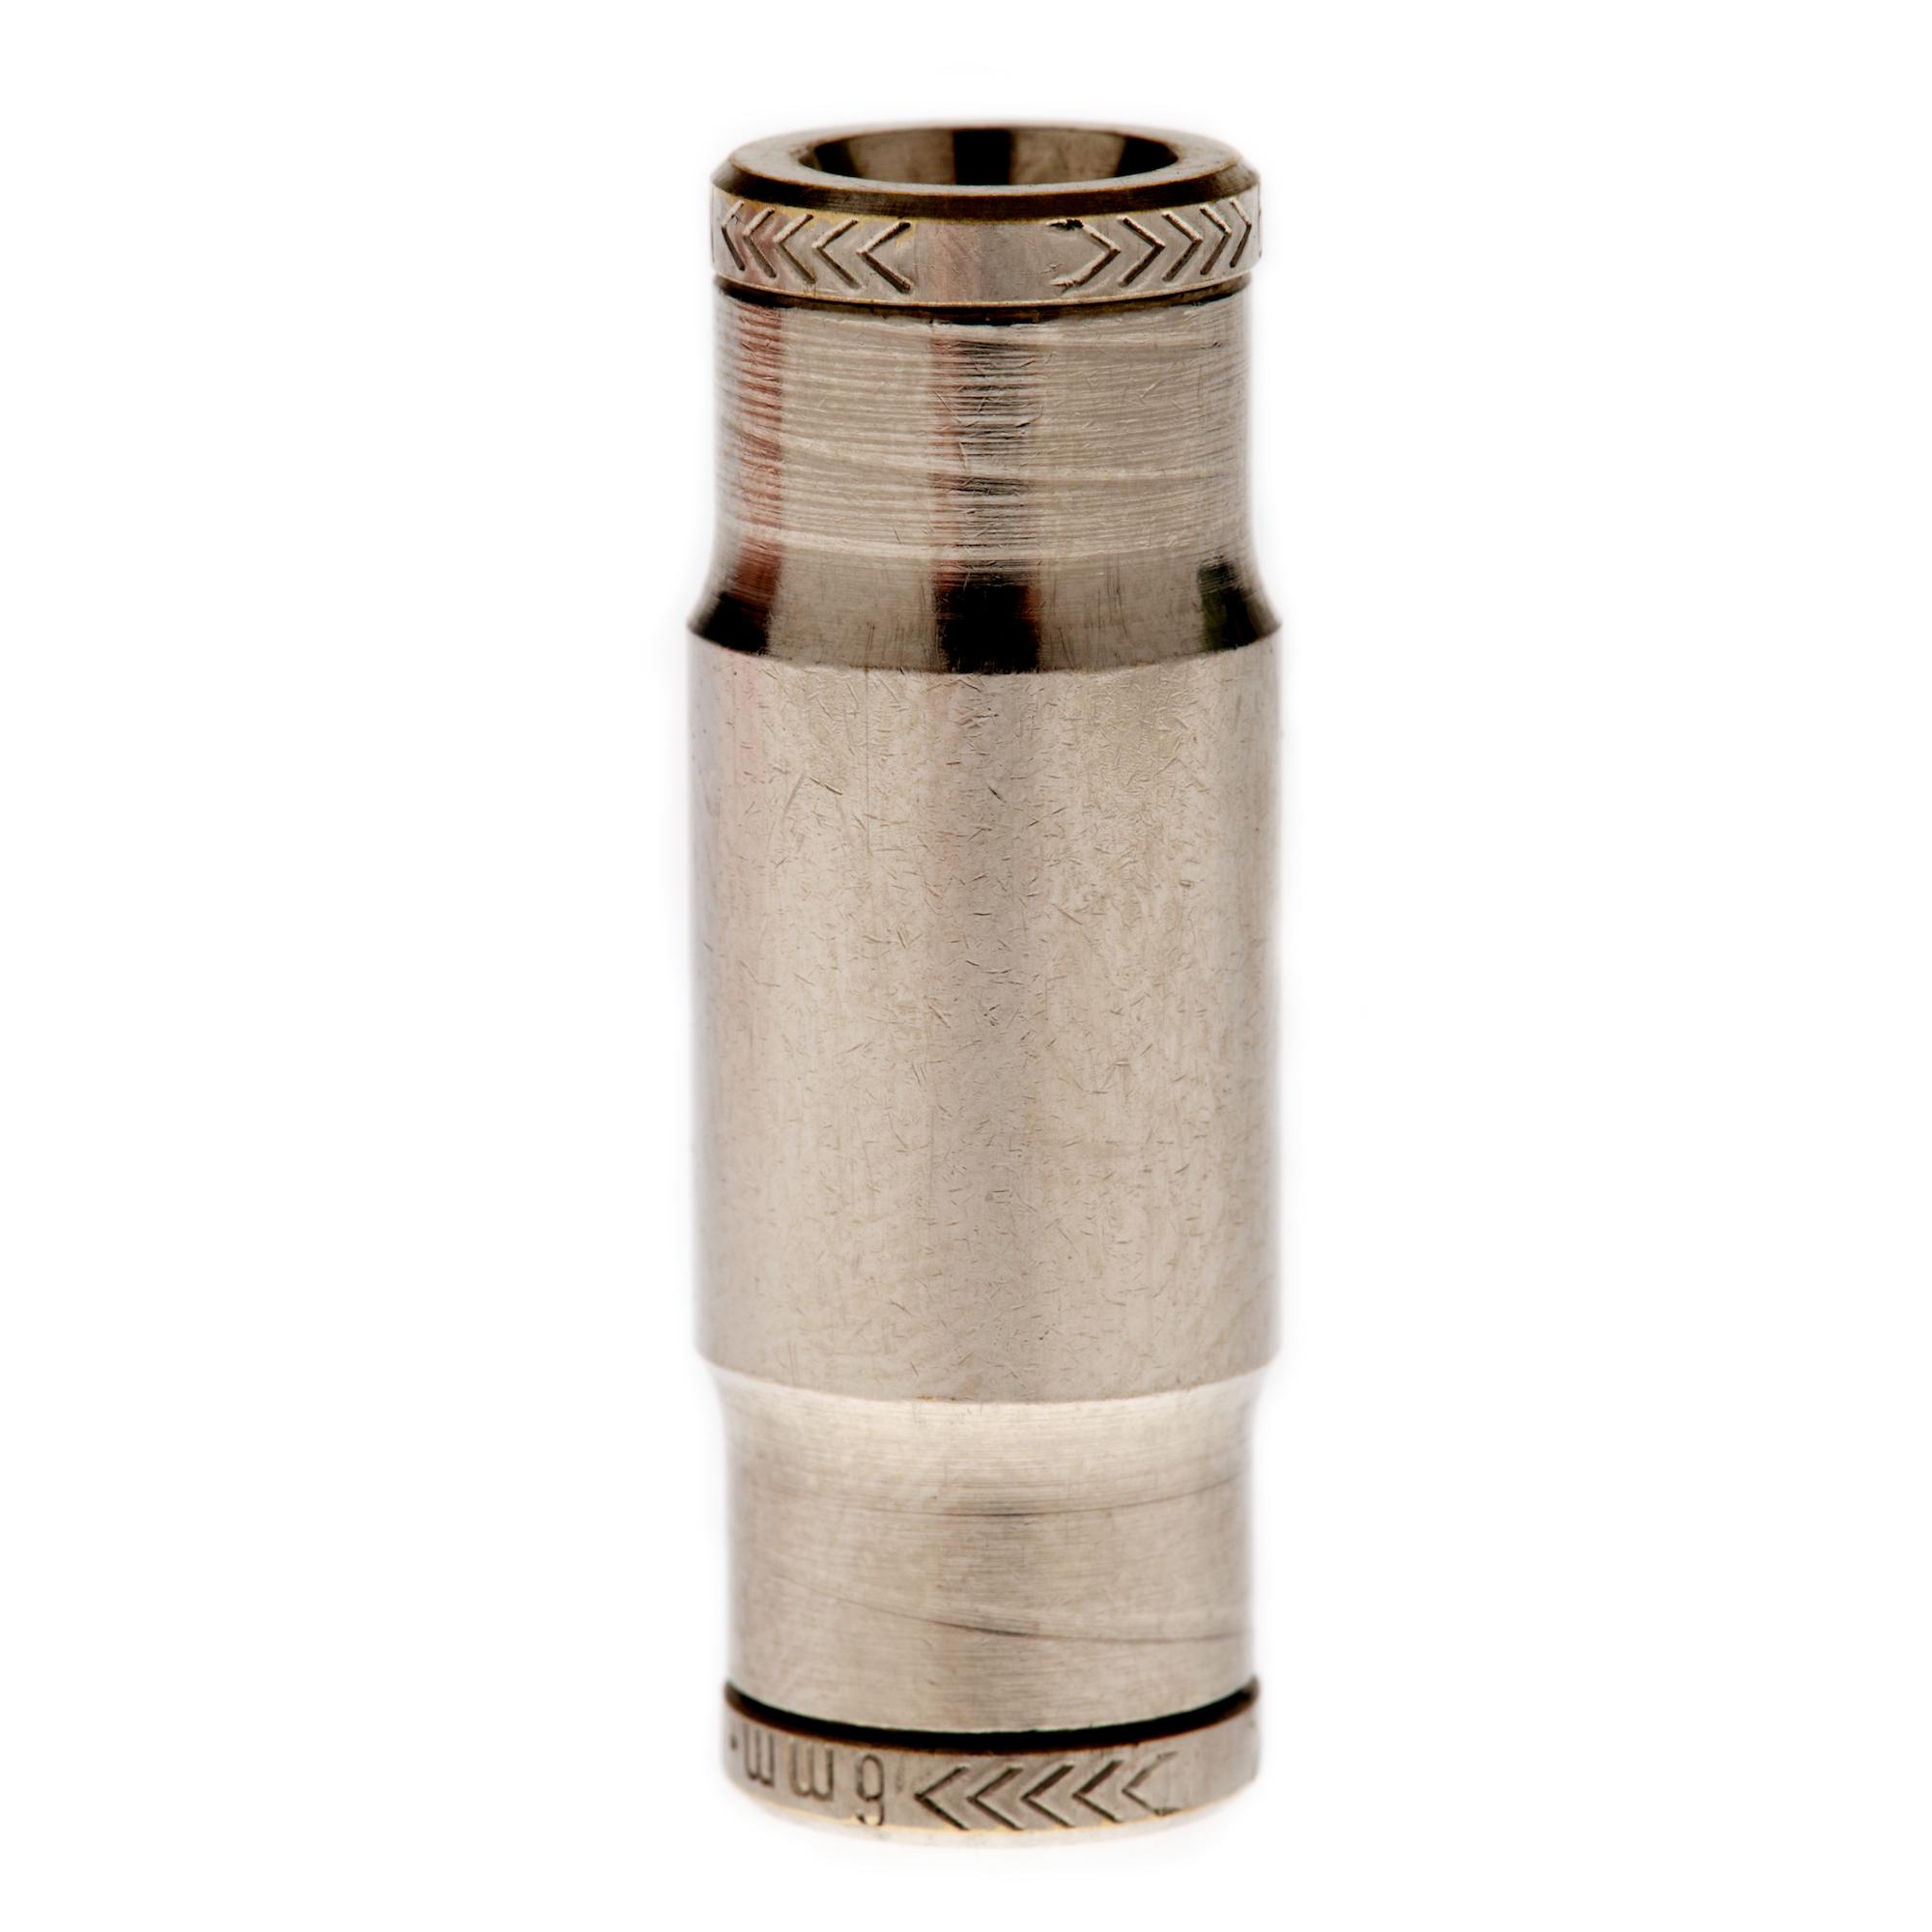 XL8-013 - Compression Fitting 6mm